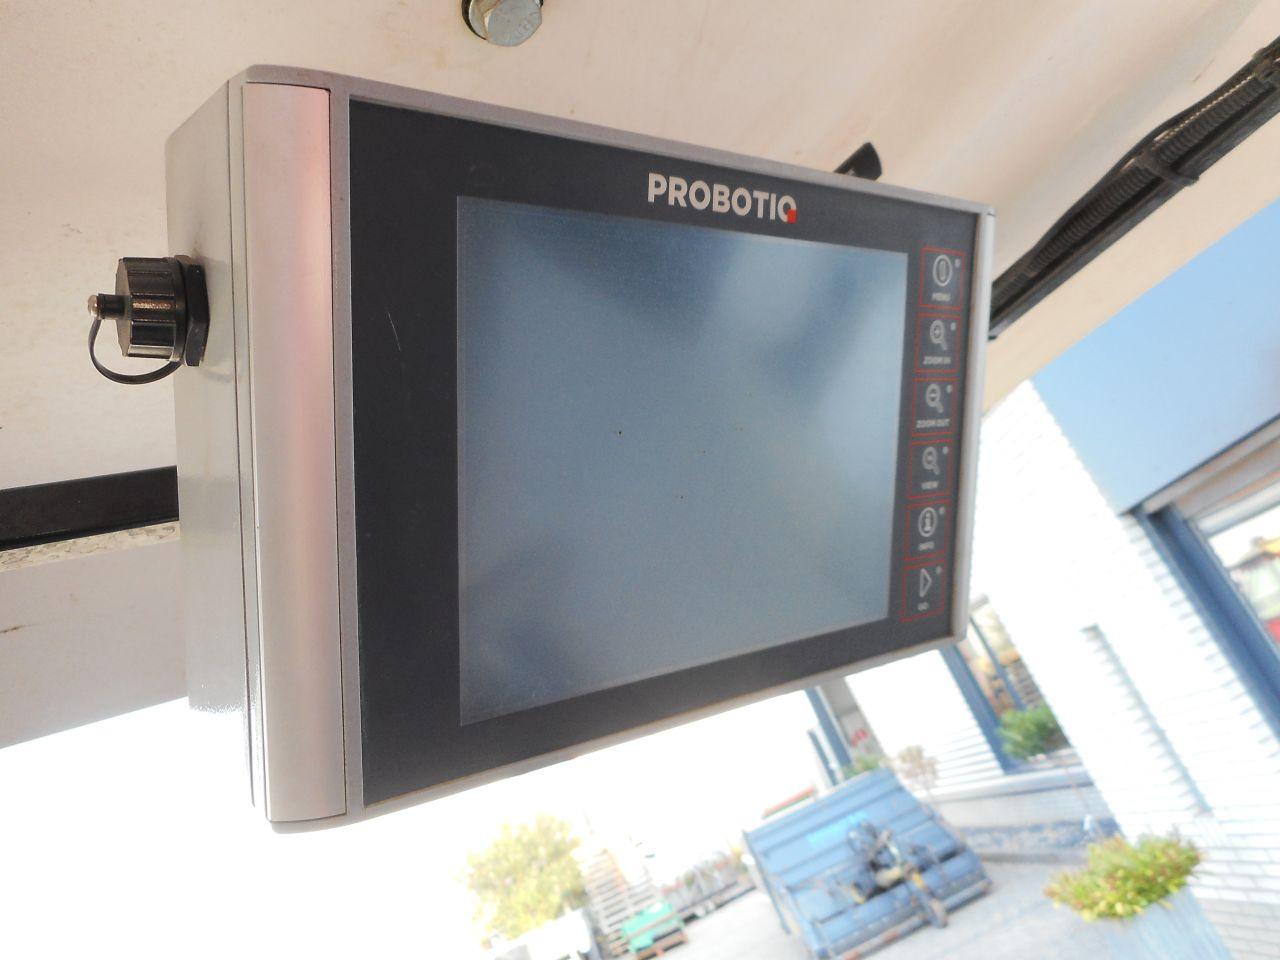 Toro 5610 reelmaster GPS